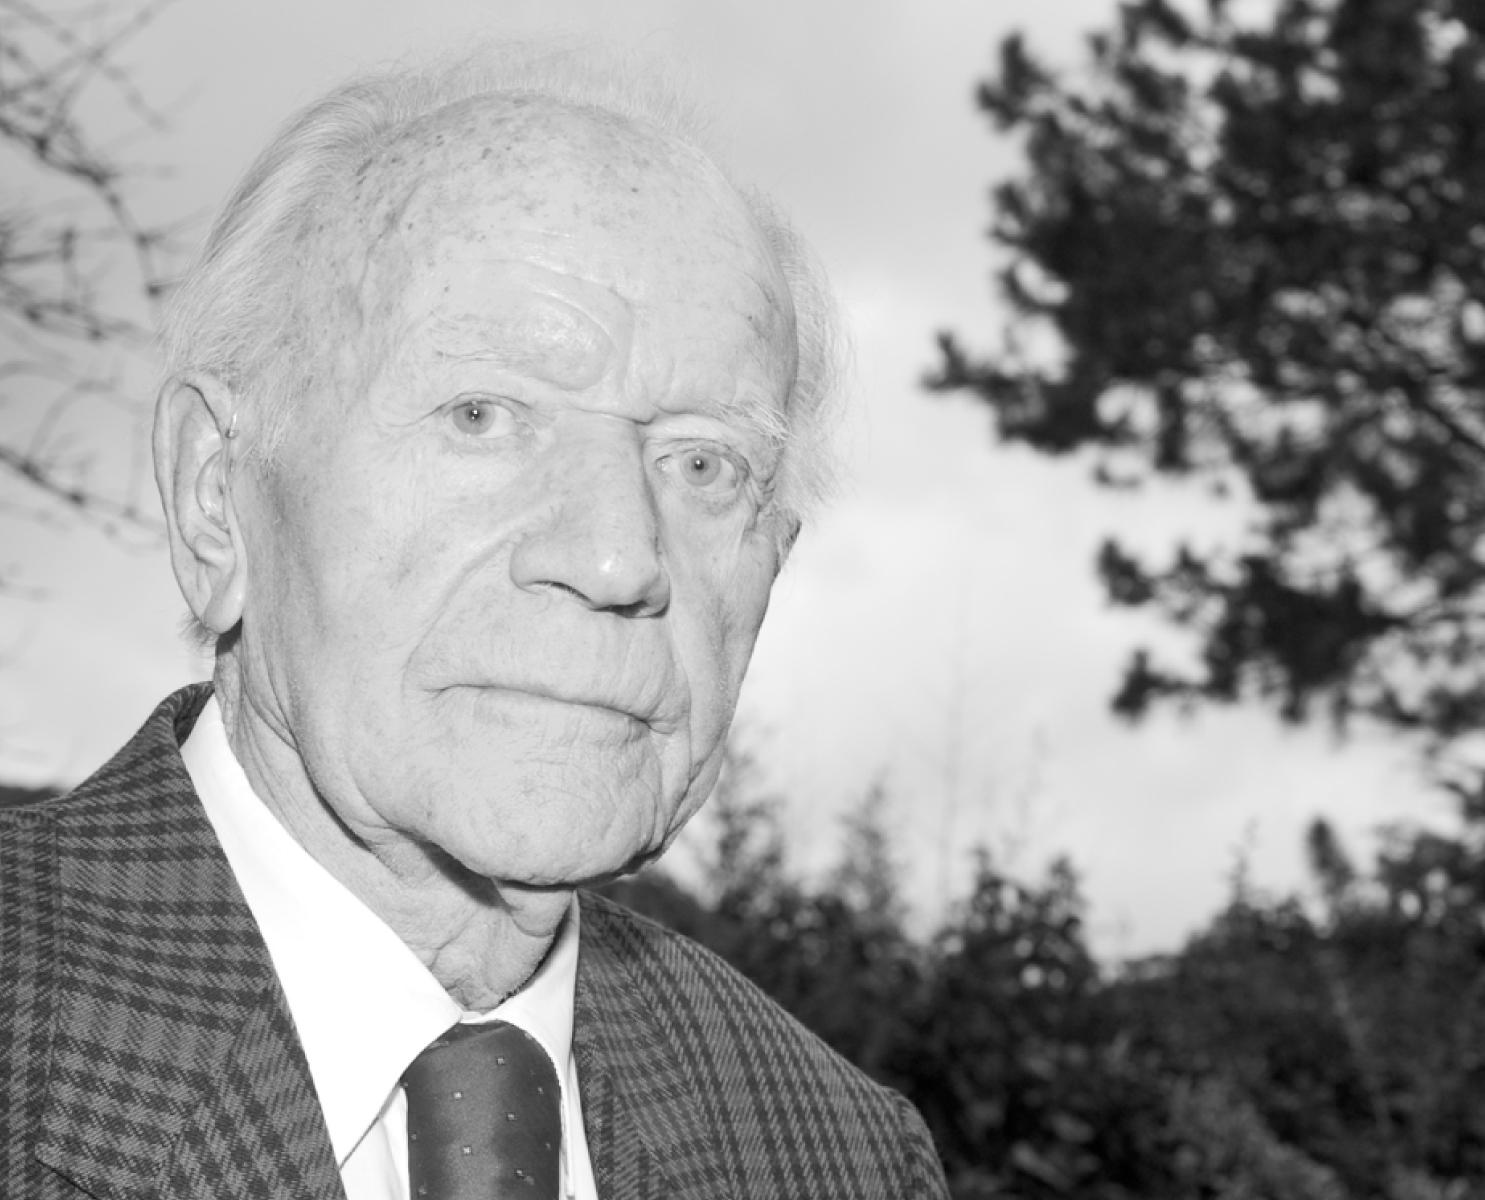 Gerhard Munch